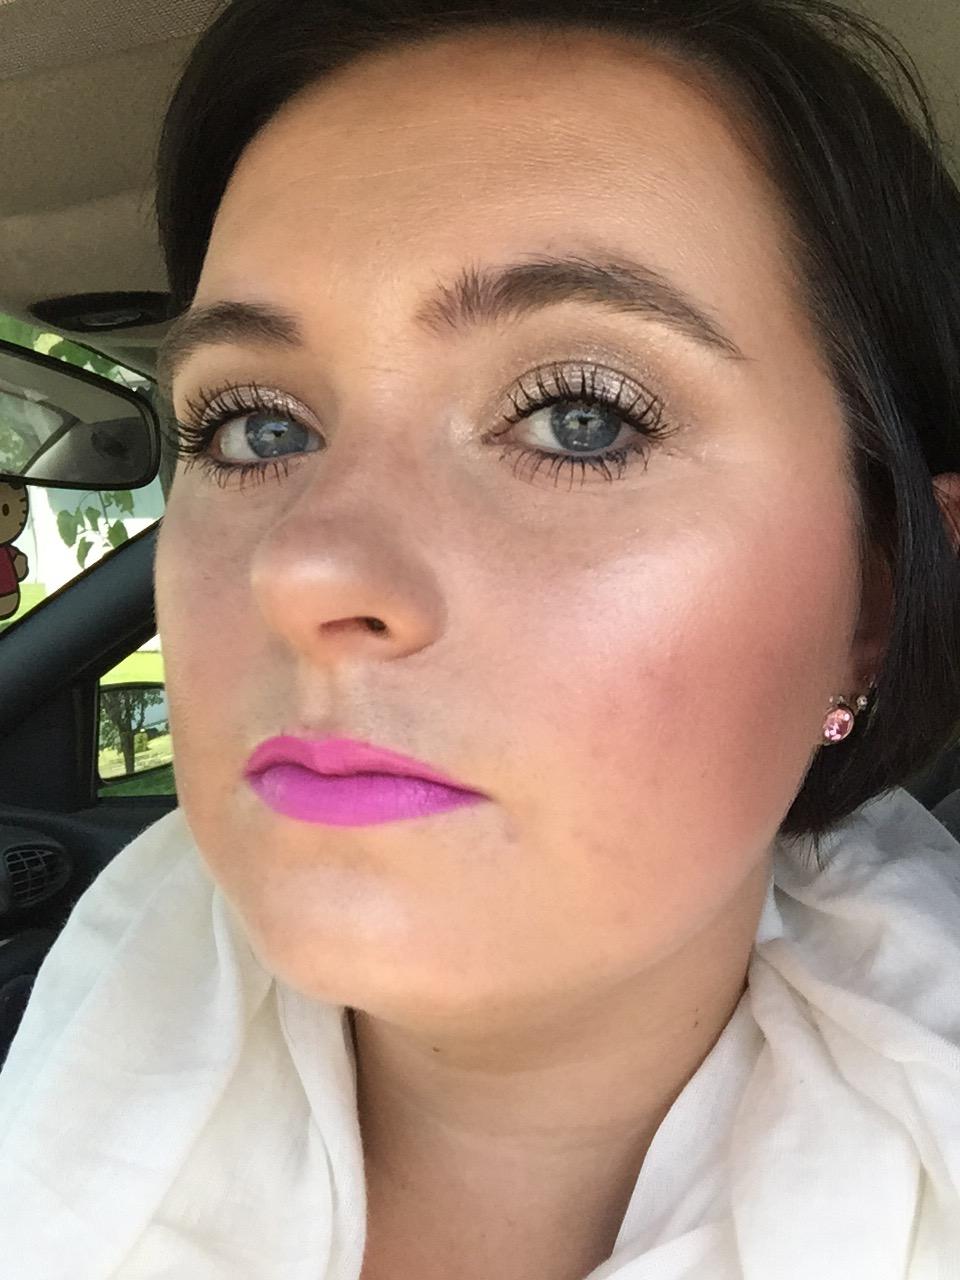 Colourpop Lippie Stix Swatches Love All These Colors: Colourpop Wifey Lippie Stix Review